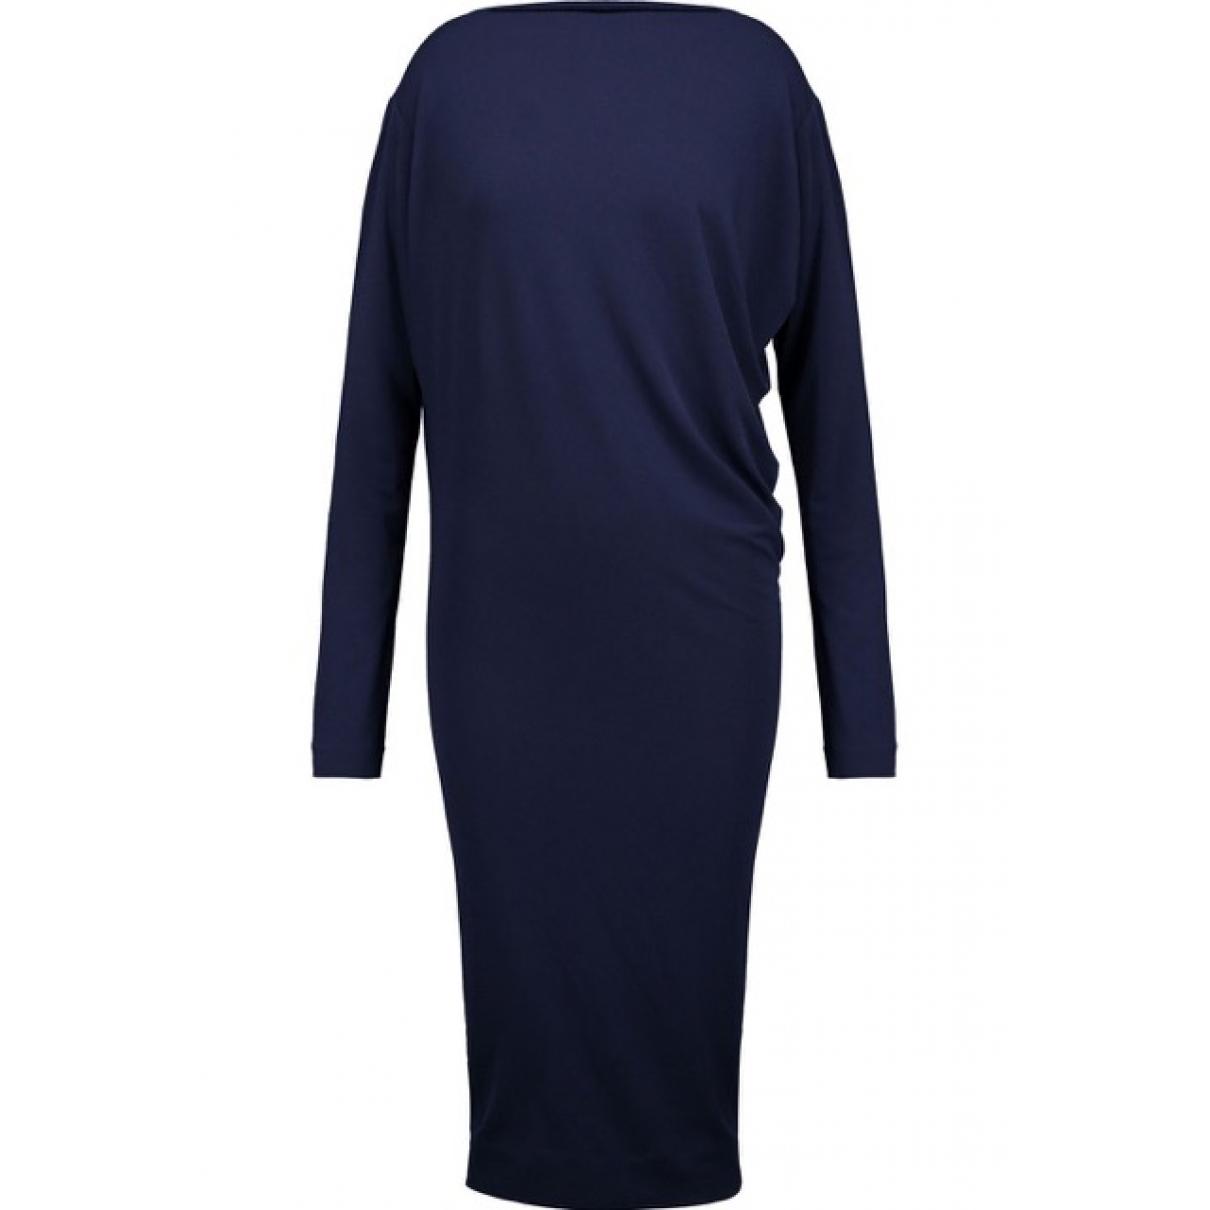 By Malene Birger \N Kleid in  Blau Polyester